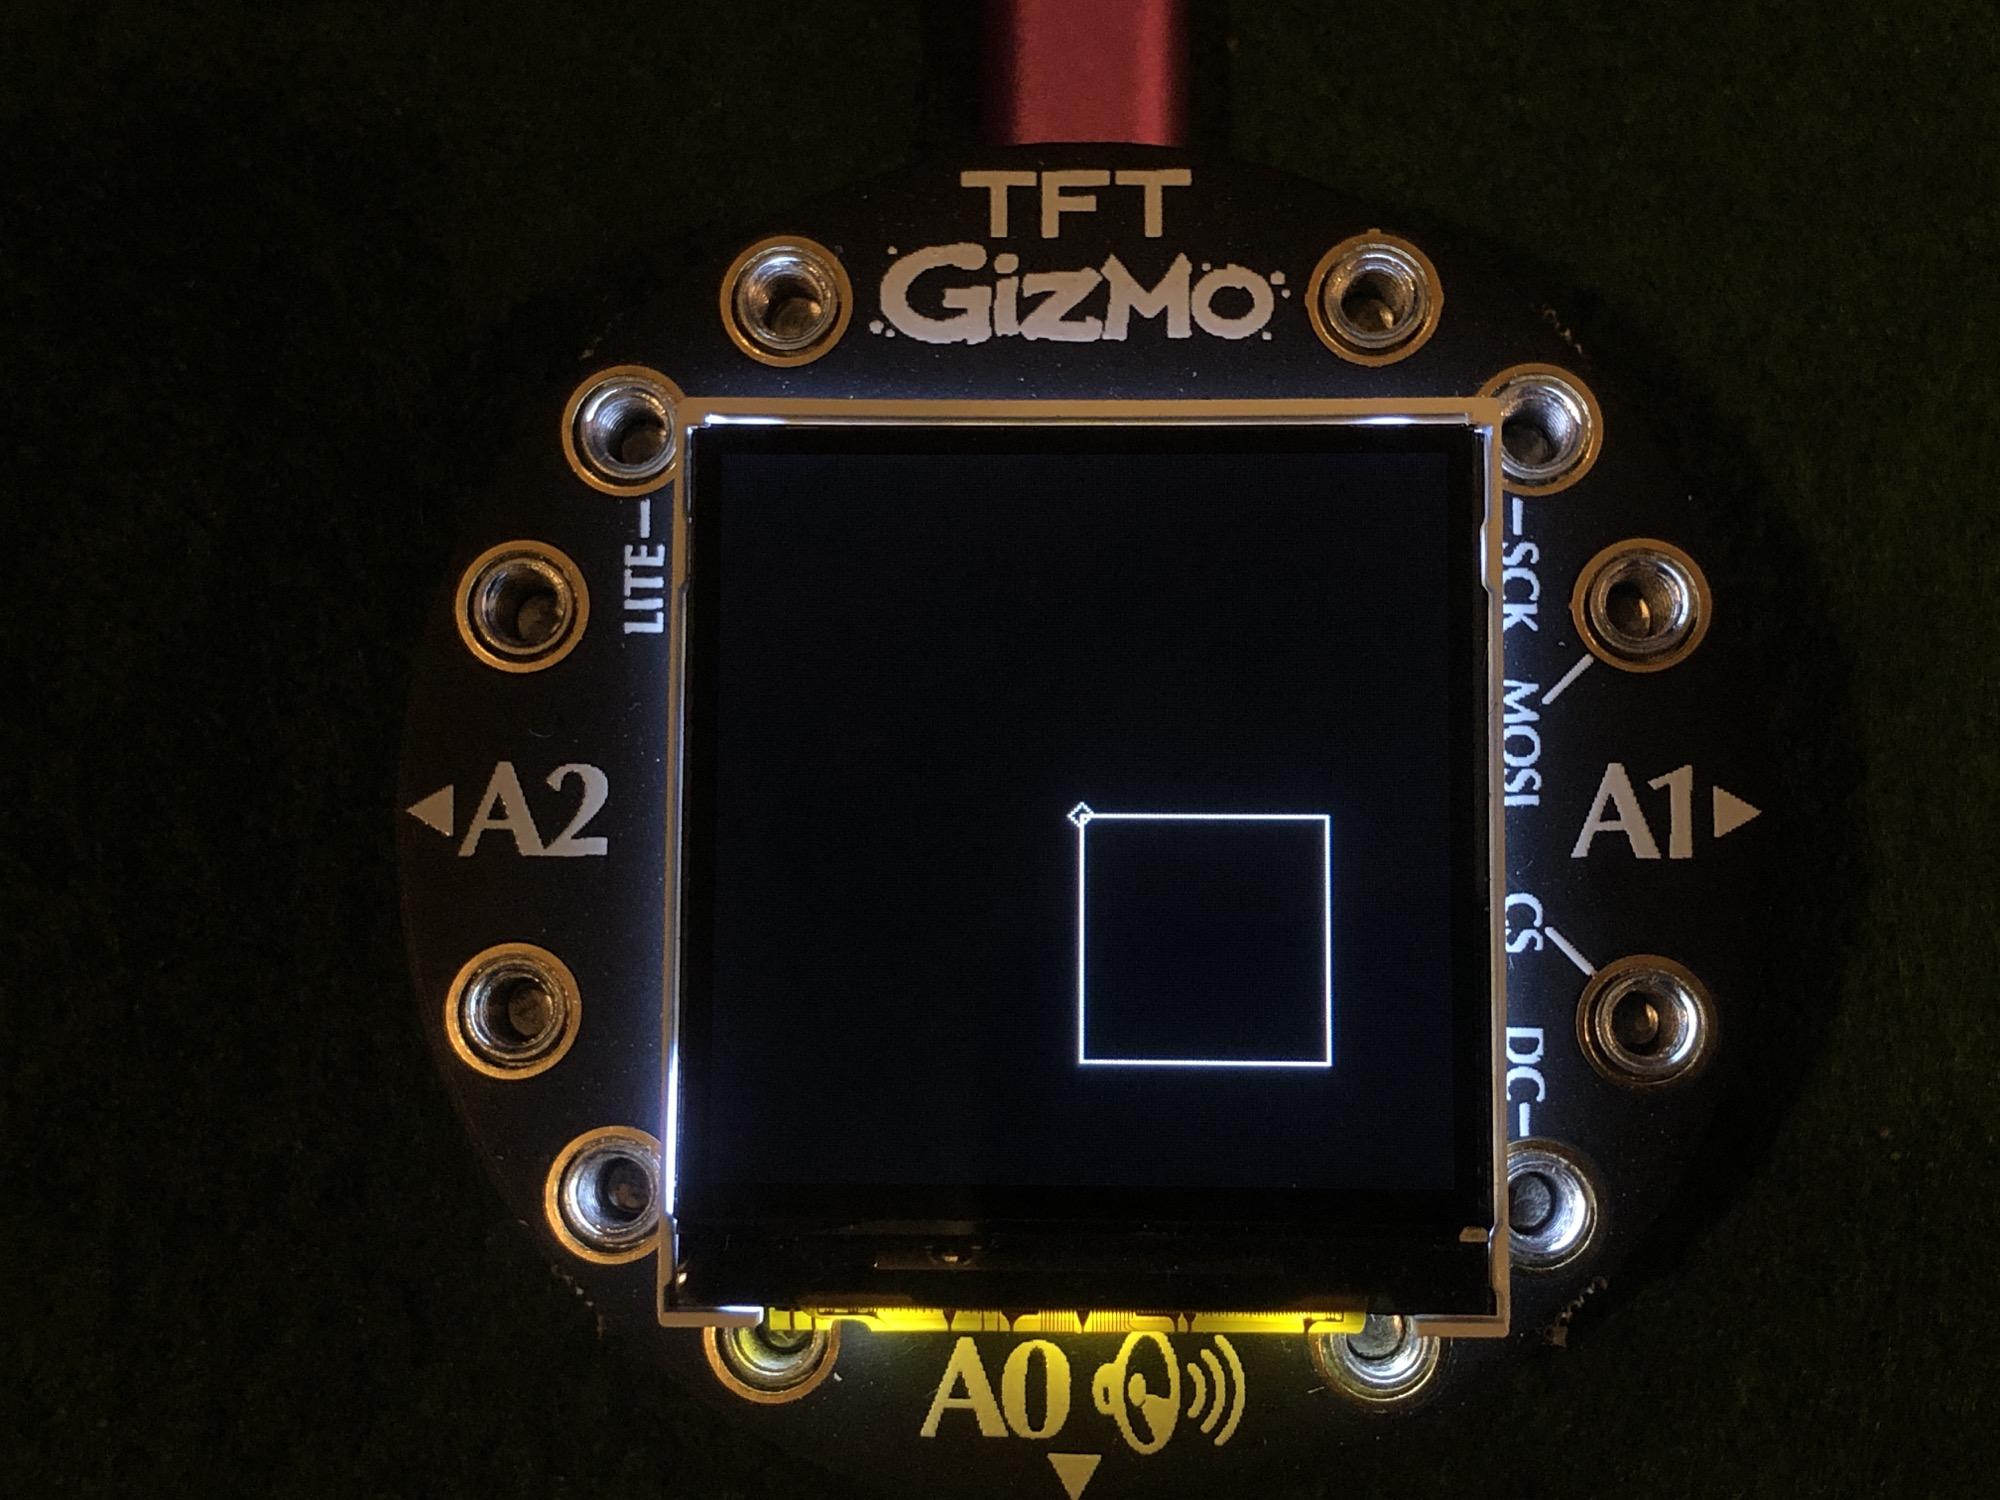 circuitpython_turtle_gizmo_9175.jpg